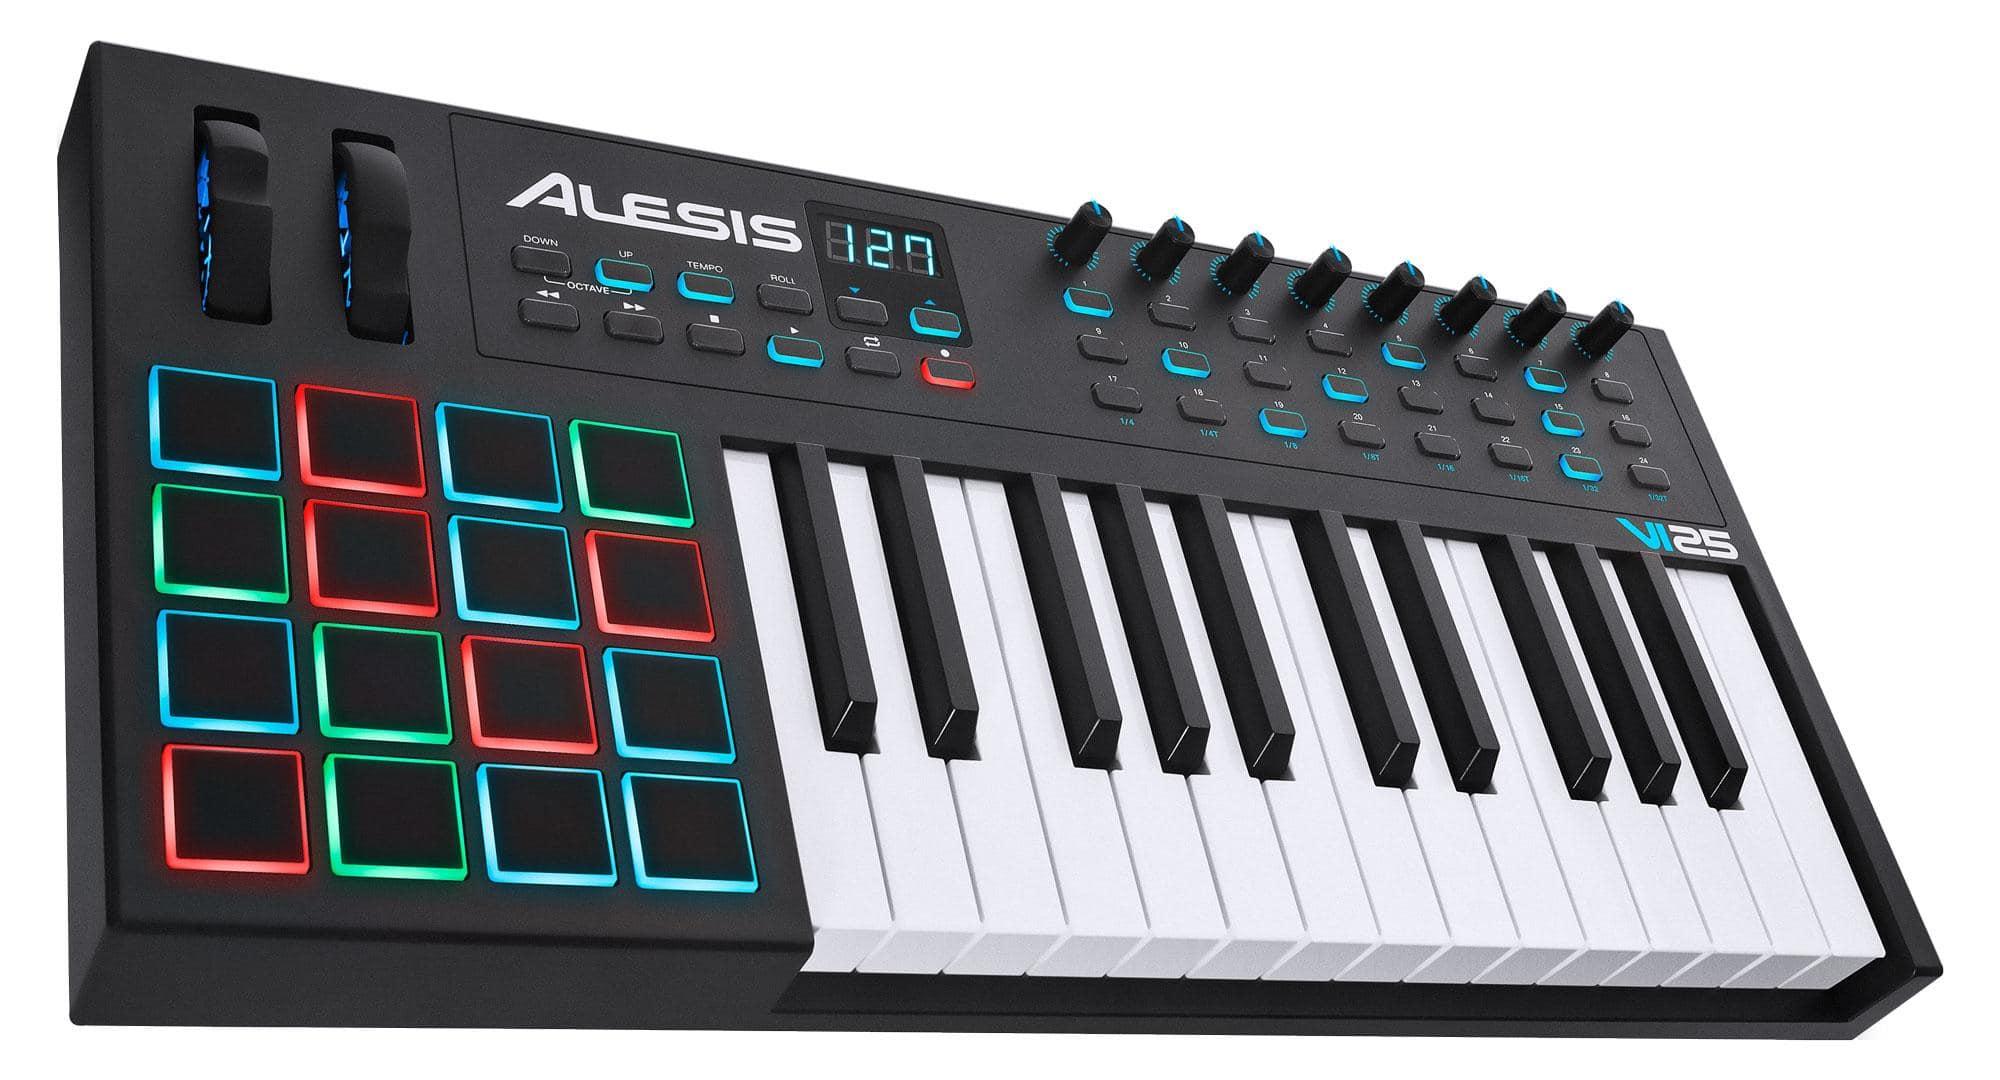 Midimasterkeyboards - Alesis VI25 USB MIDI Pad|Keyboard Controller mit 25 Tasten - Onlineshop Musikhaus Kirstein